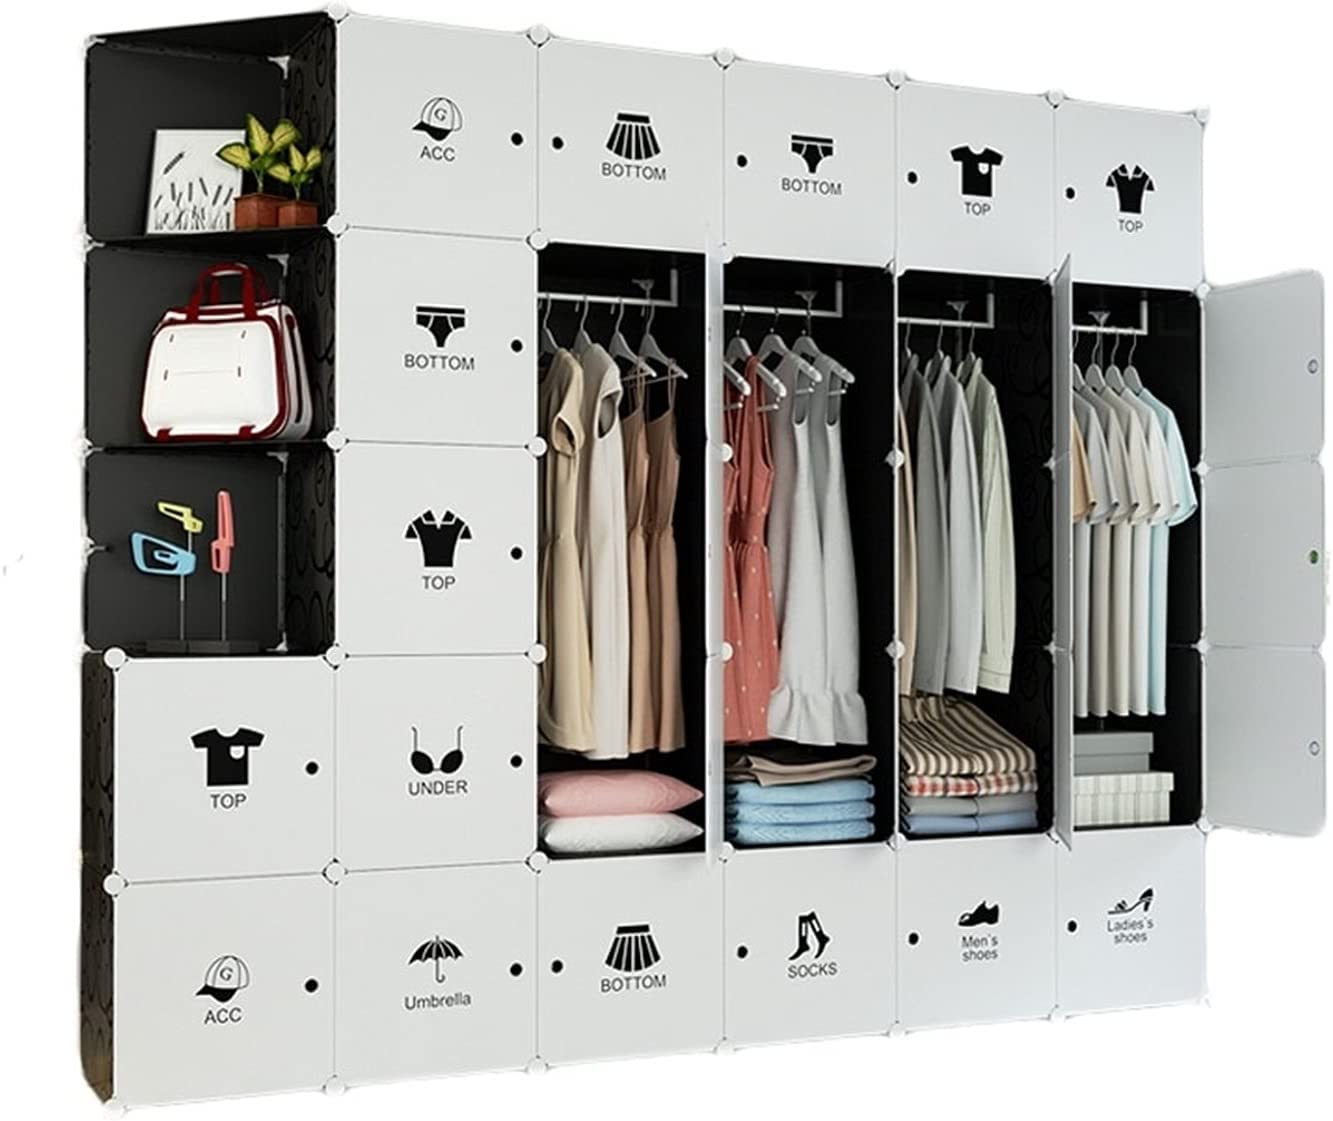 Max San Francisco Mall 88% OFF QIAOLI Plastic Portable Wardrobe Closet Clothes Armo Bedroom for